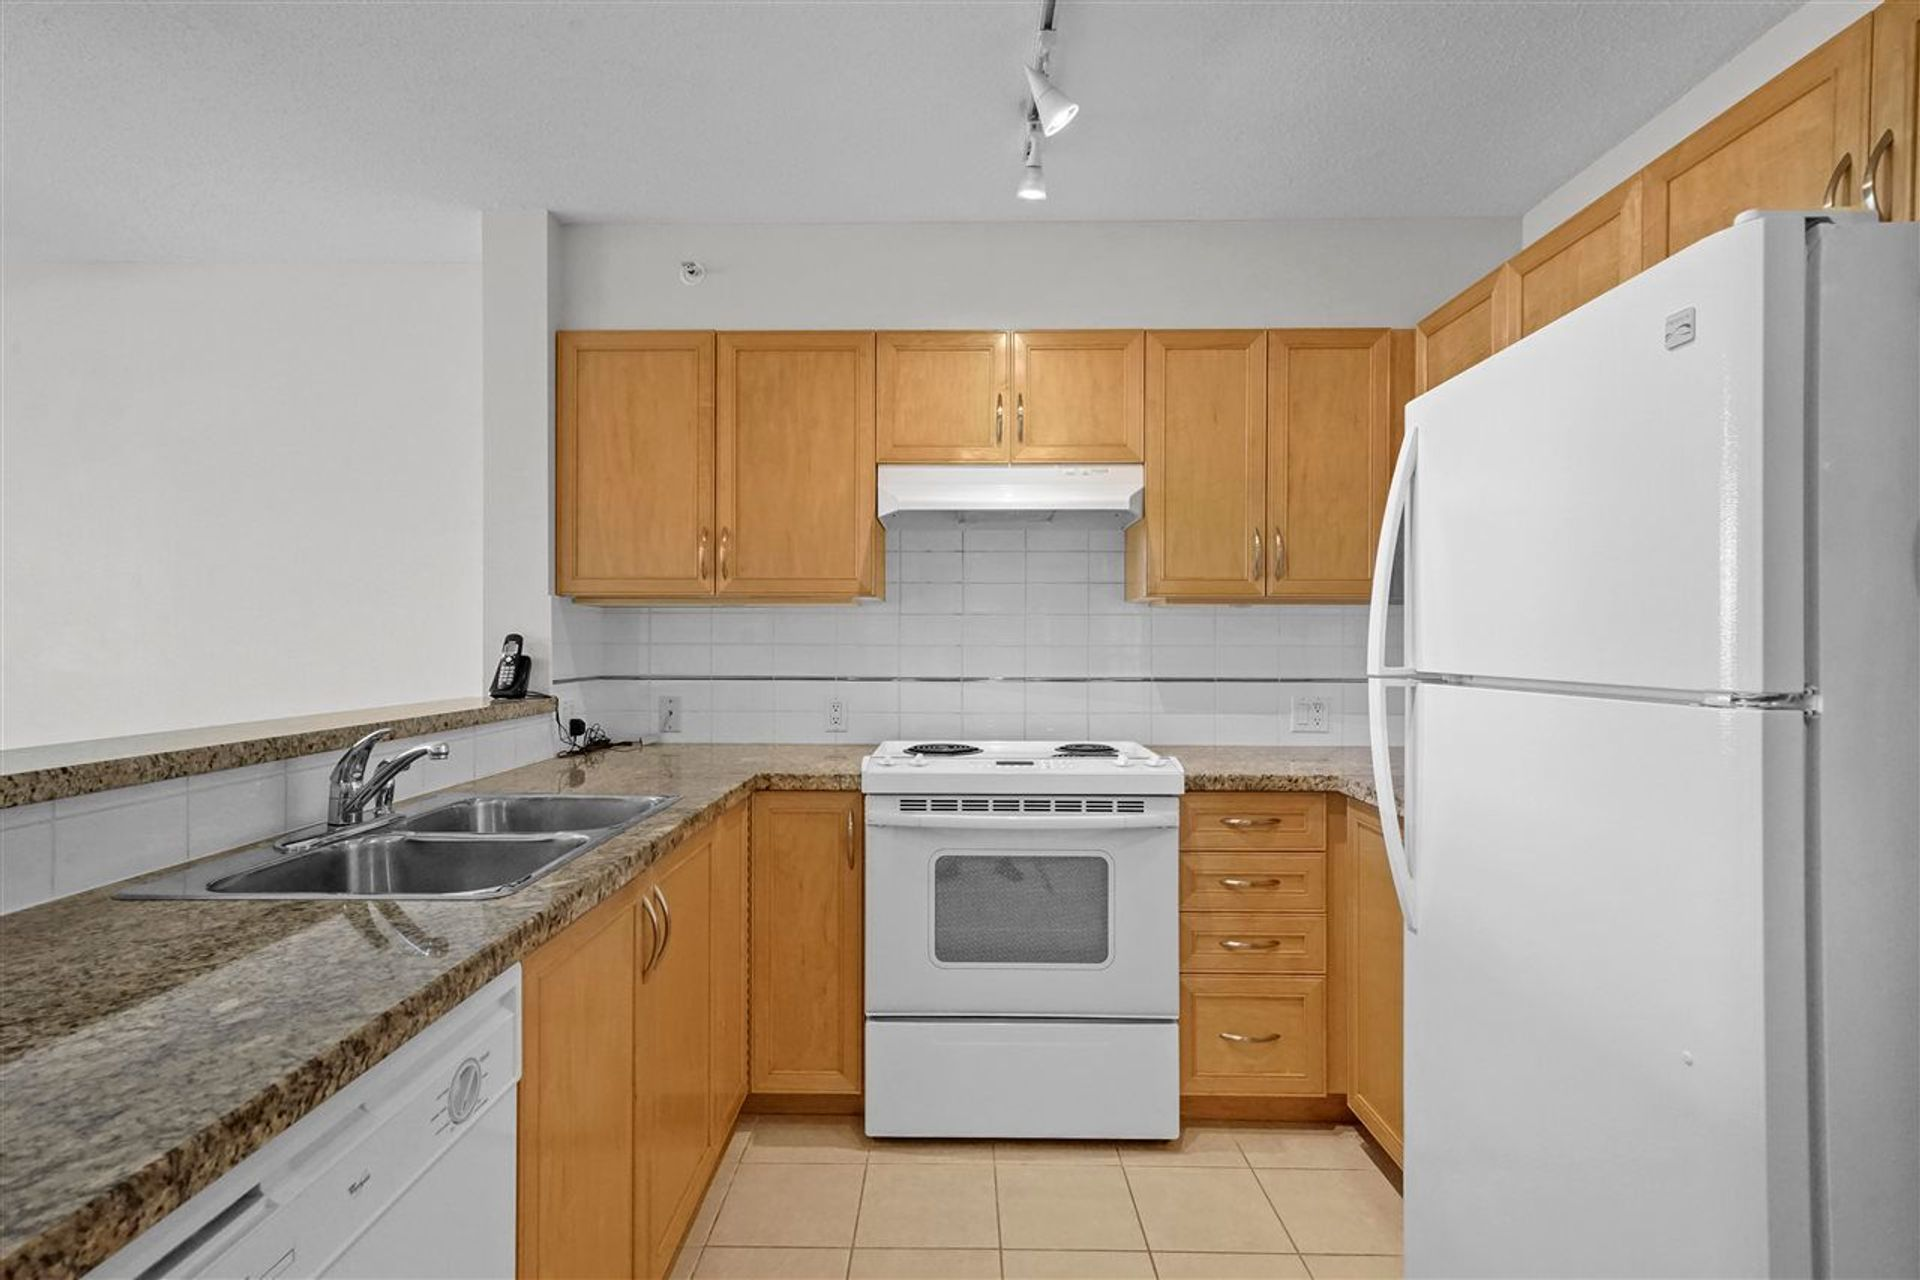 4398-buchanan-street-brentwood-park-burnaby-north-04 at 405 - 4398 Buchanan Street, Brentwood Park, Burnaby North